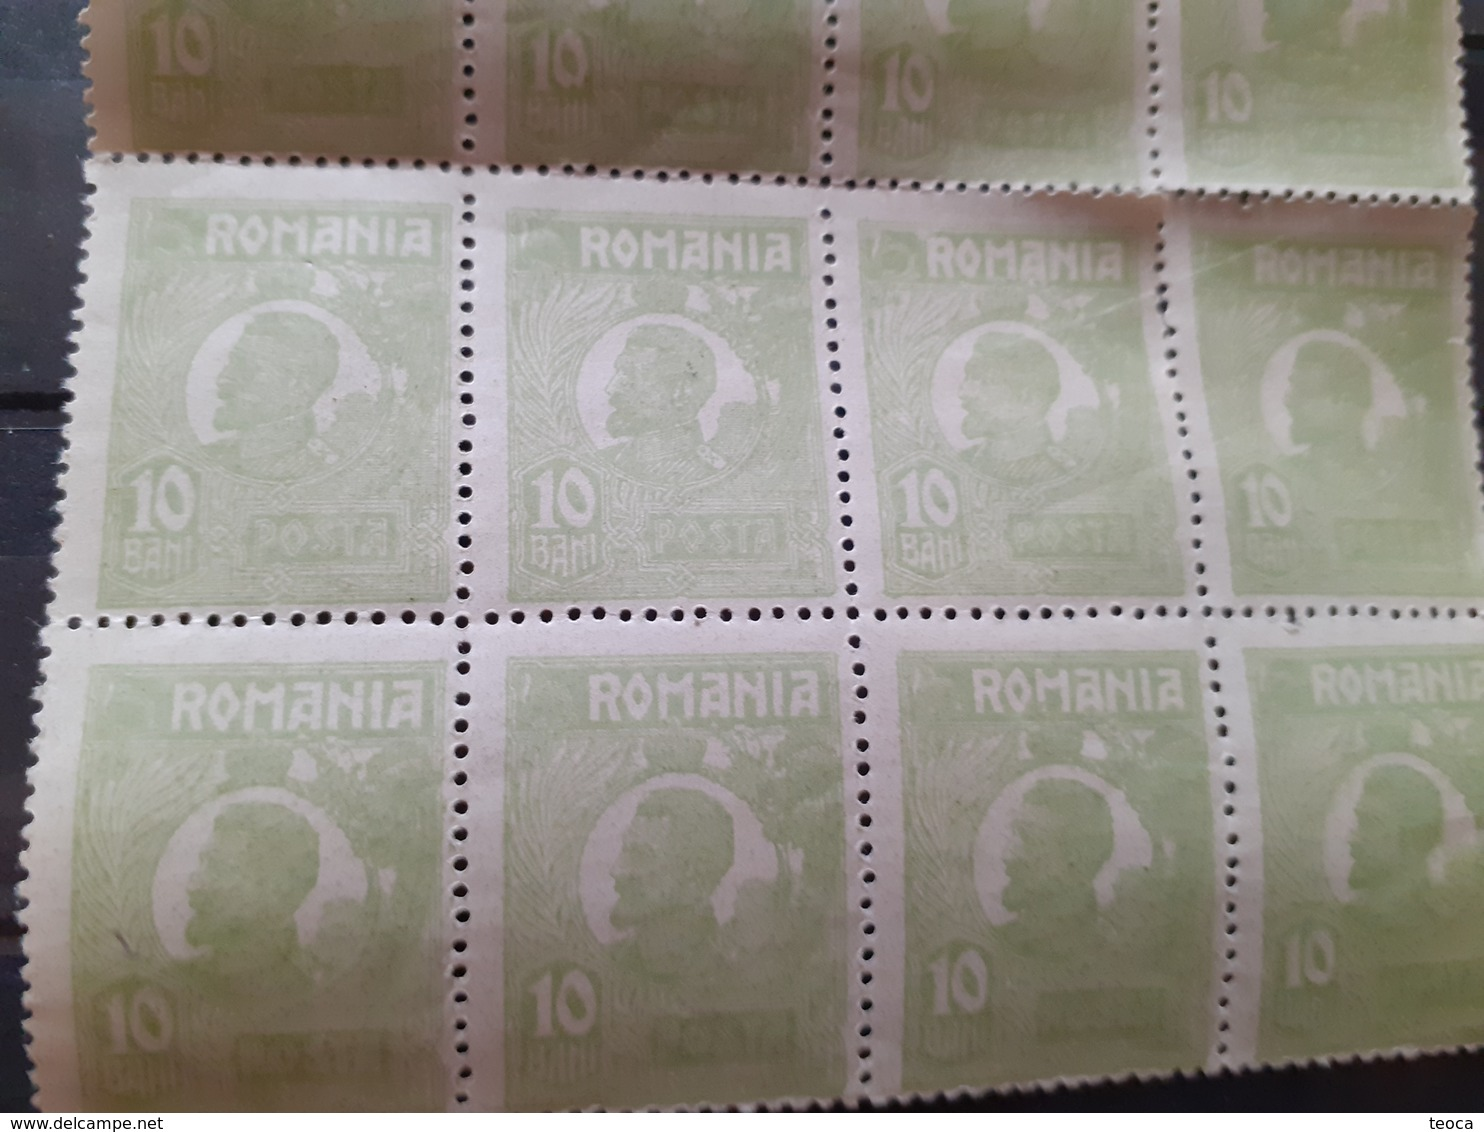 Romania 1922 King Ferdinand 10 Bani, Green,  Souvenir SHEET X15 STAMPS, UNUSED MNH , - Errors, Freaks & Oddities (EFO)